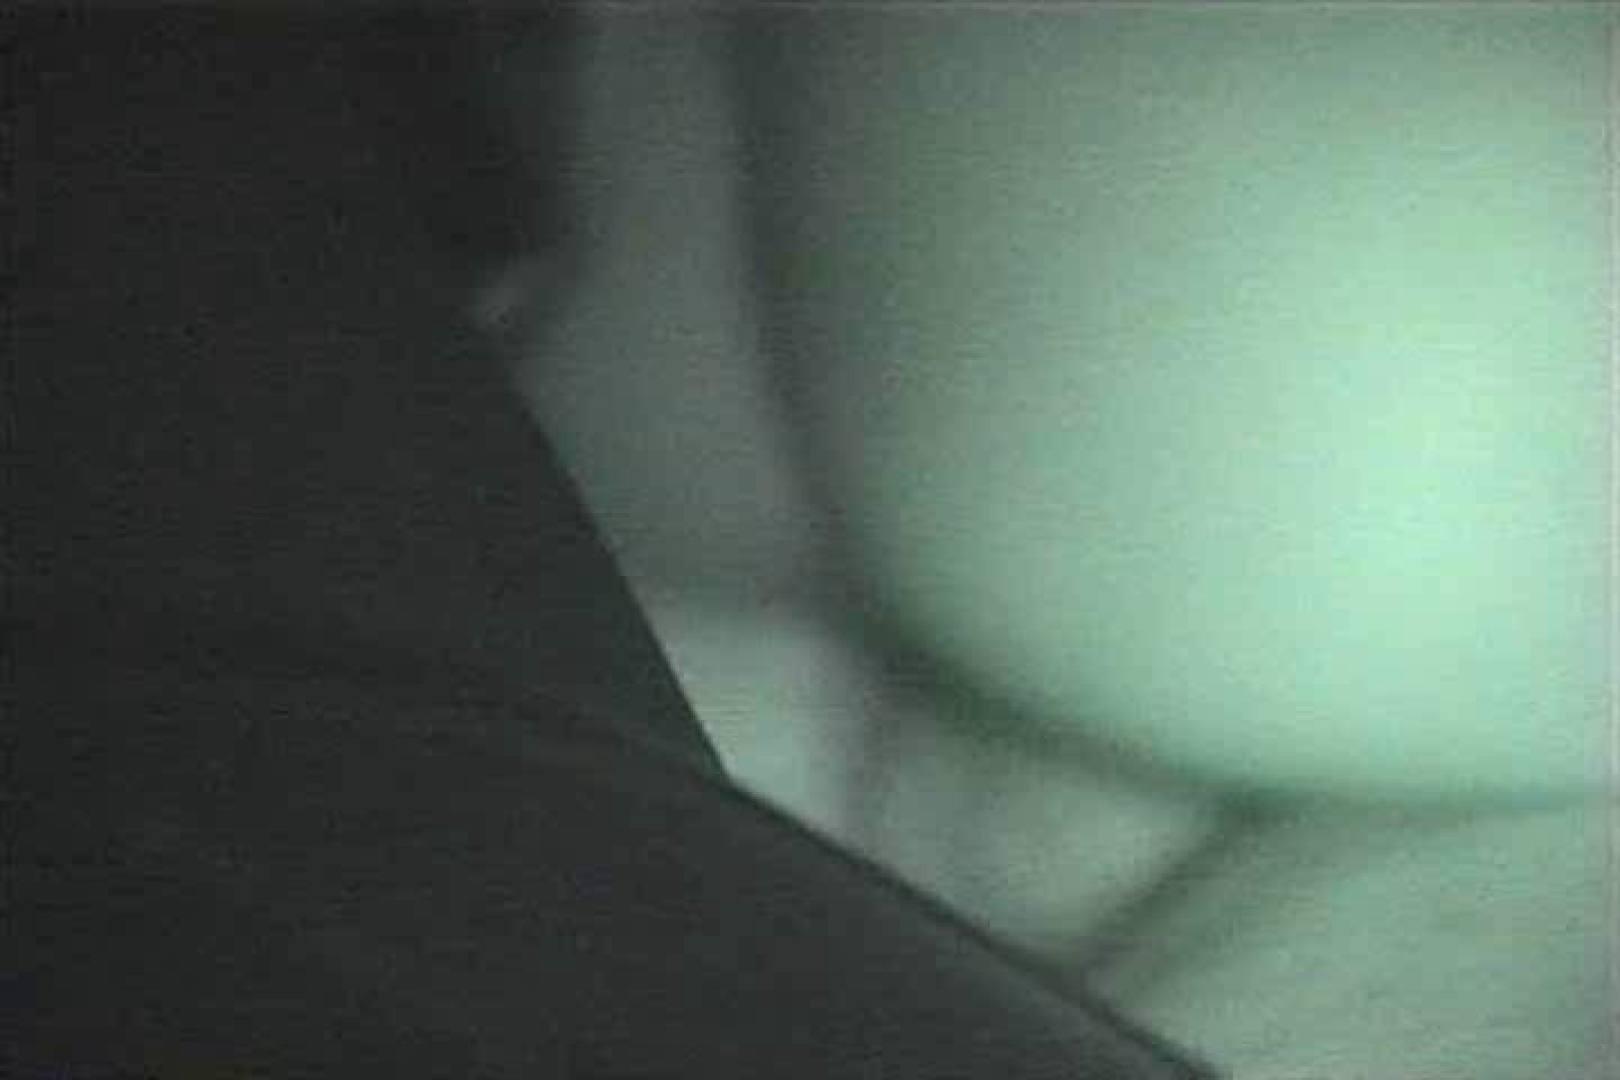 MASAさんの待ち伏せ撮り! 赤外線カーセックスVol.19 セックス オメコ無修正動画無料 101pic 47